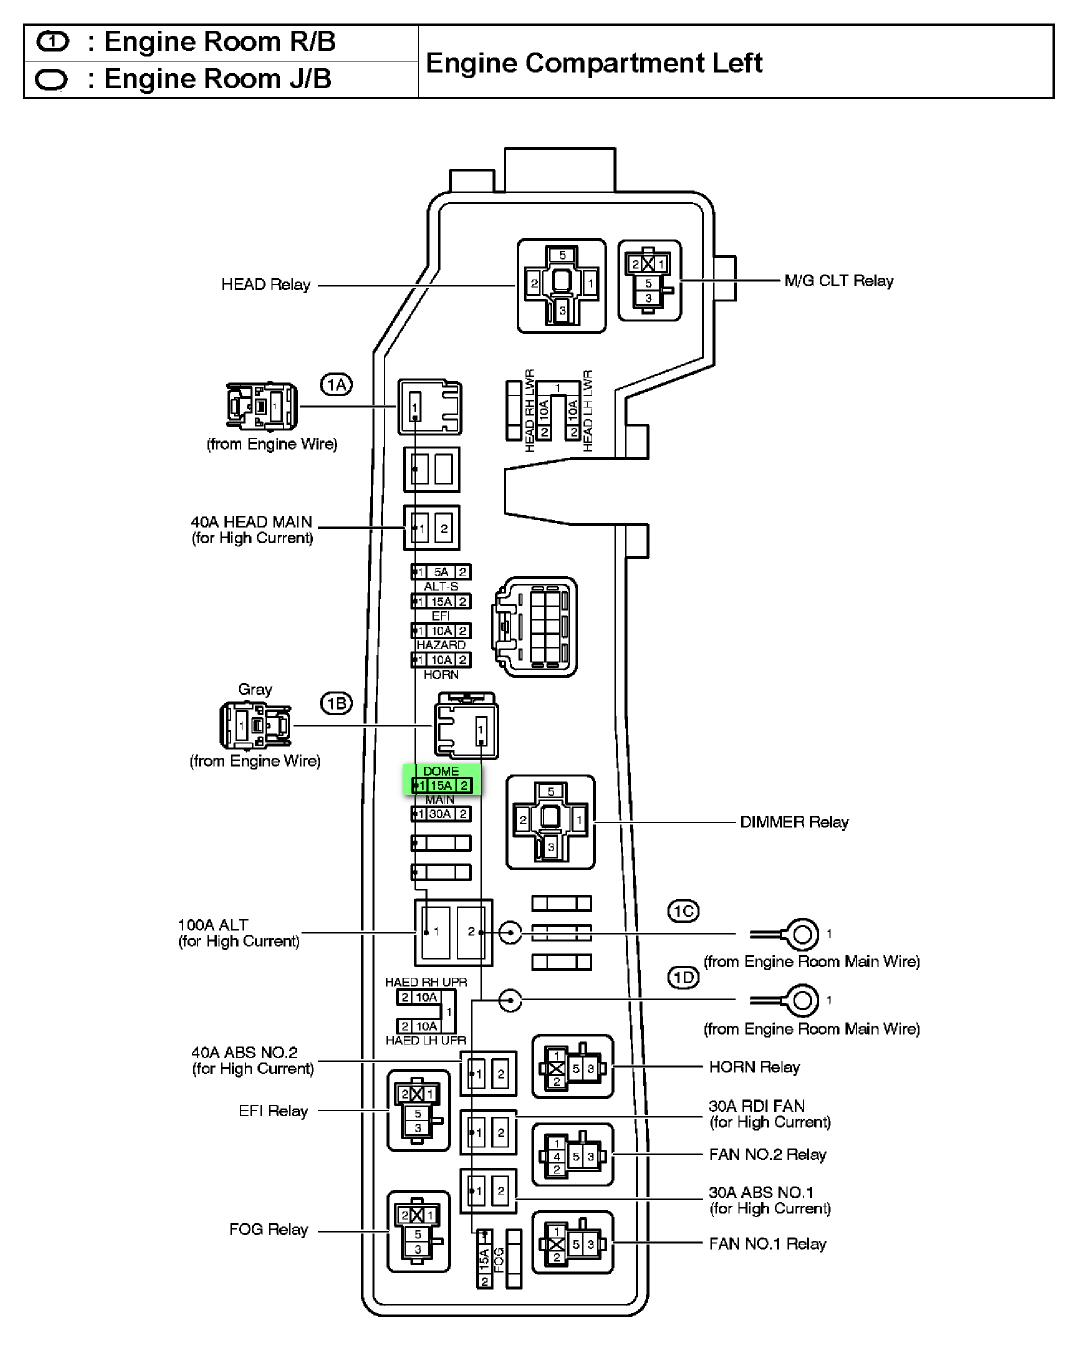 2003 toyota corolla fuse box diagram | wiring diagram 177 solution  farmacia gava